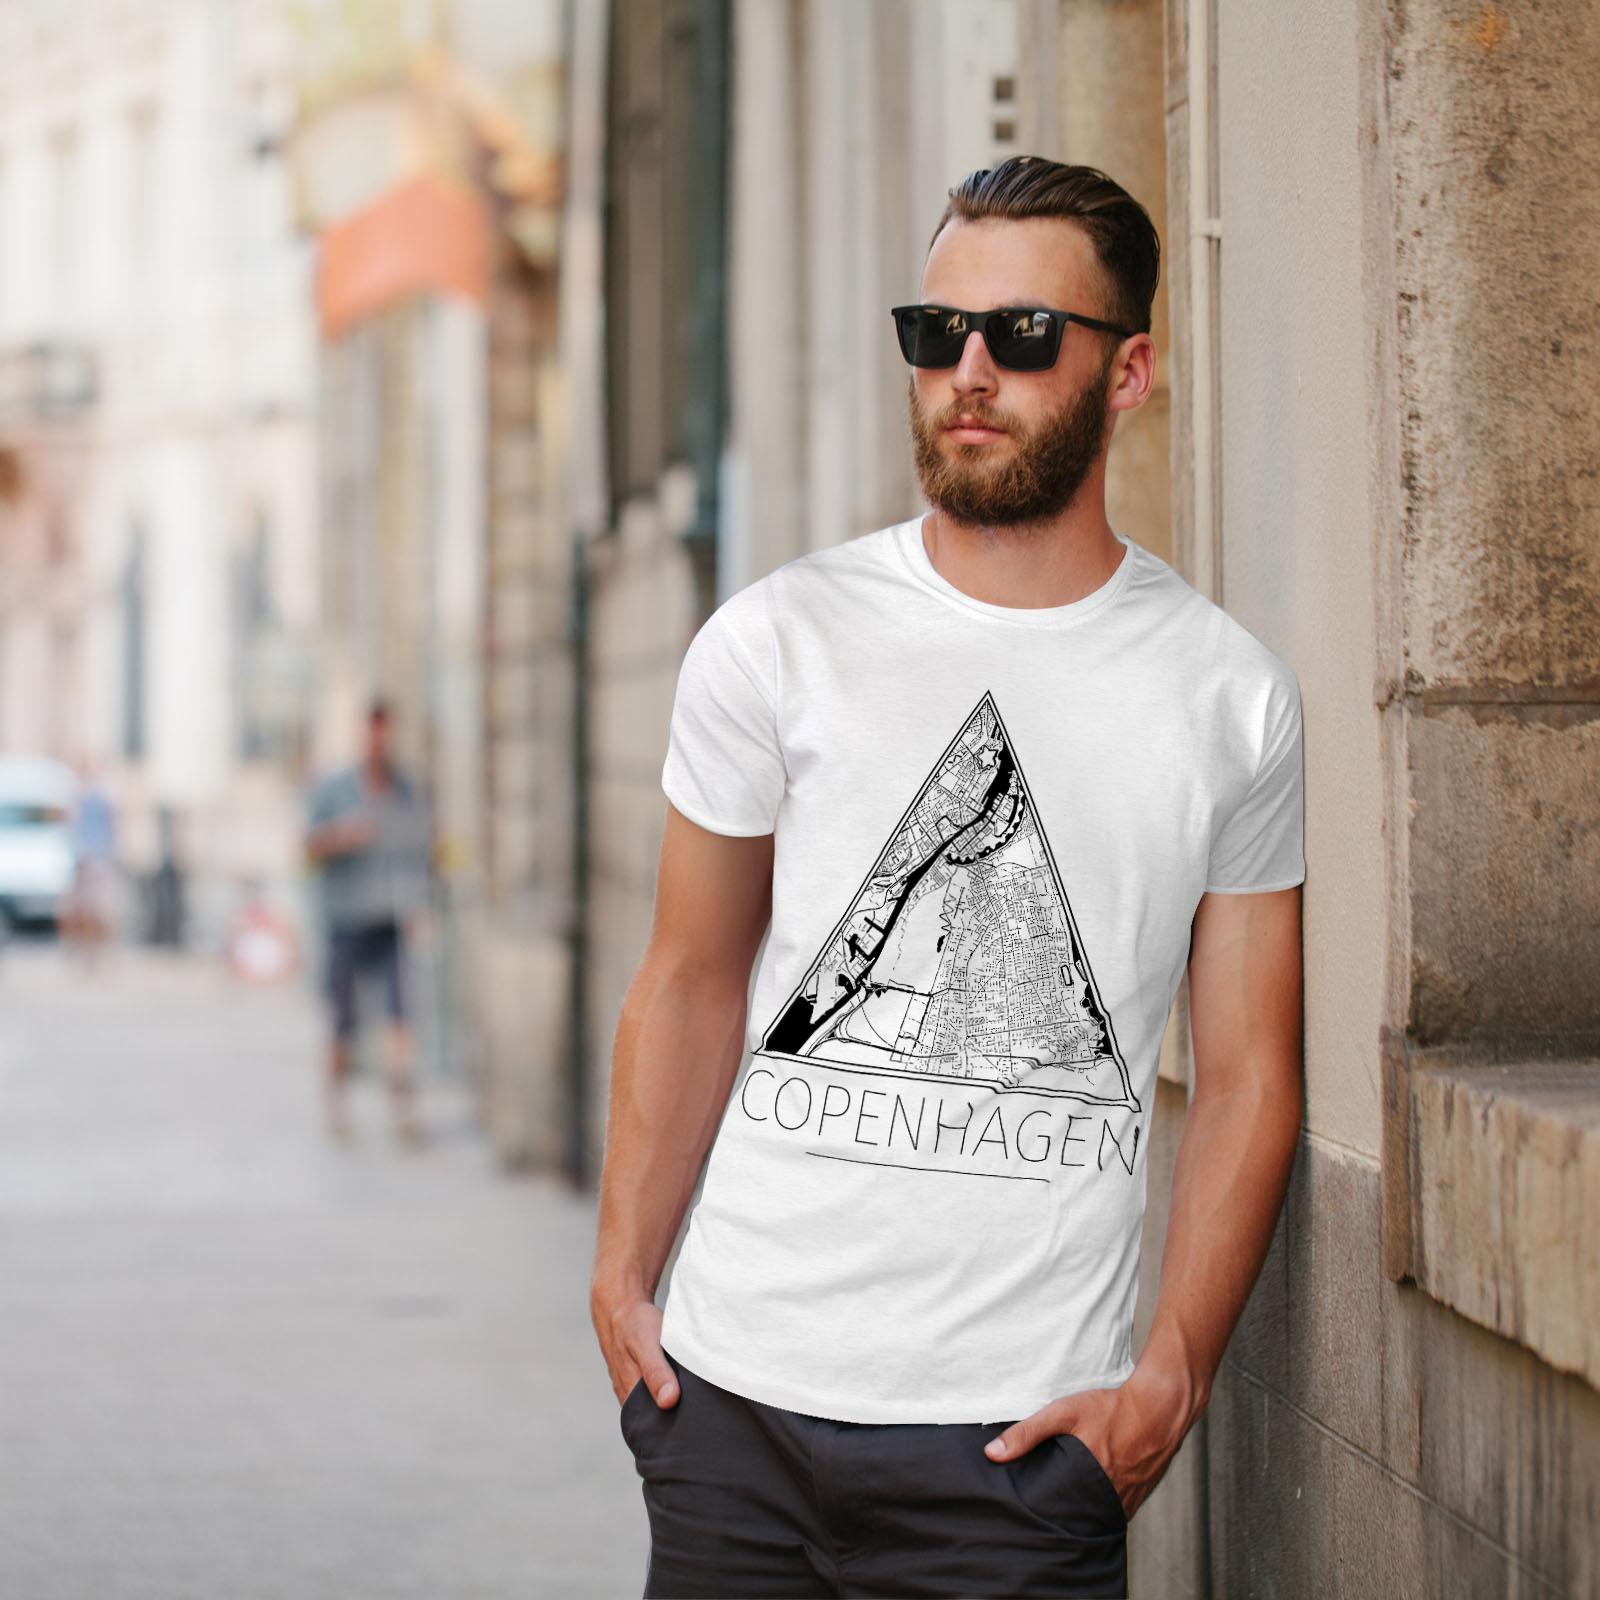 Big Graphic Design Printed Tee Wellcoda Denmark Copenhagen Mens T-shirt